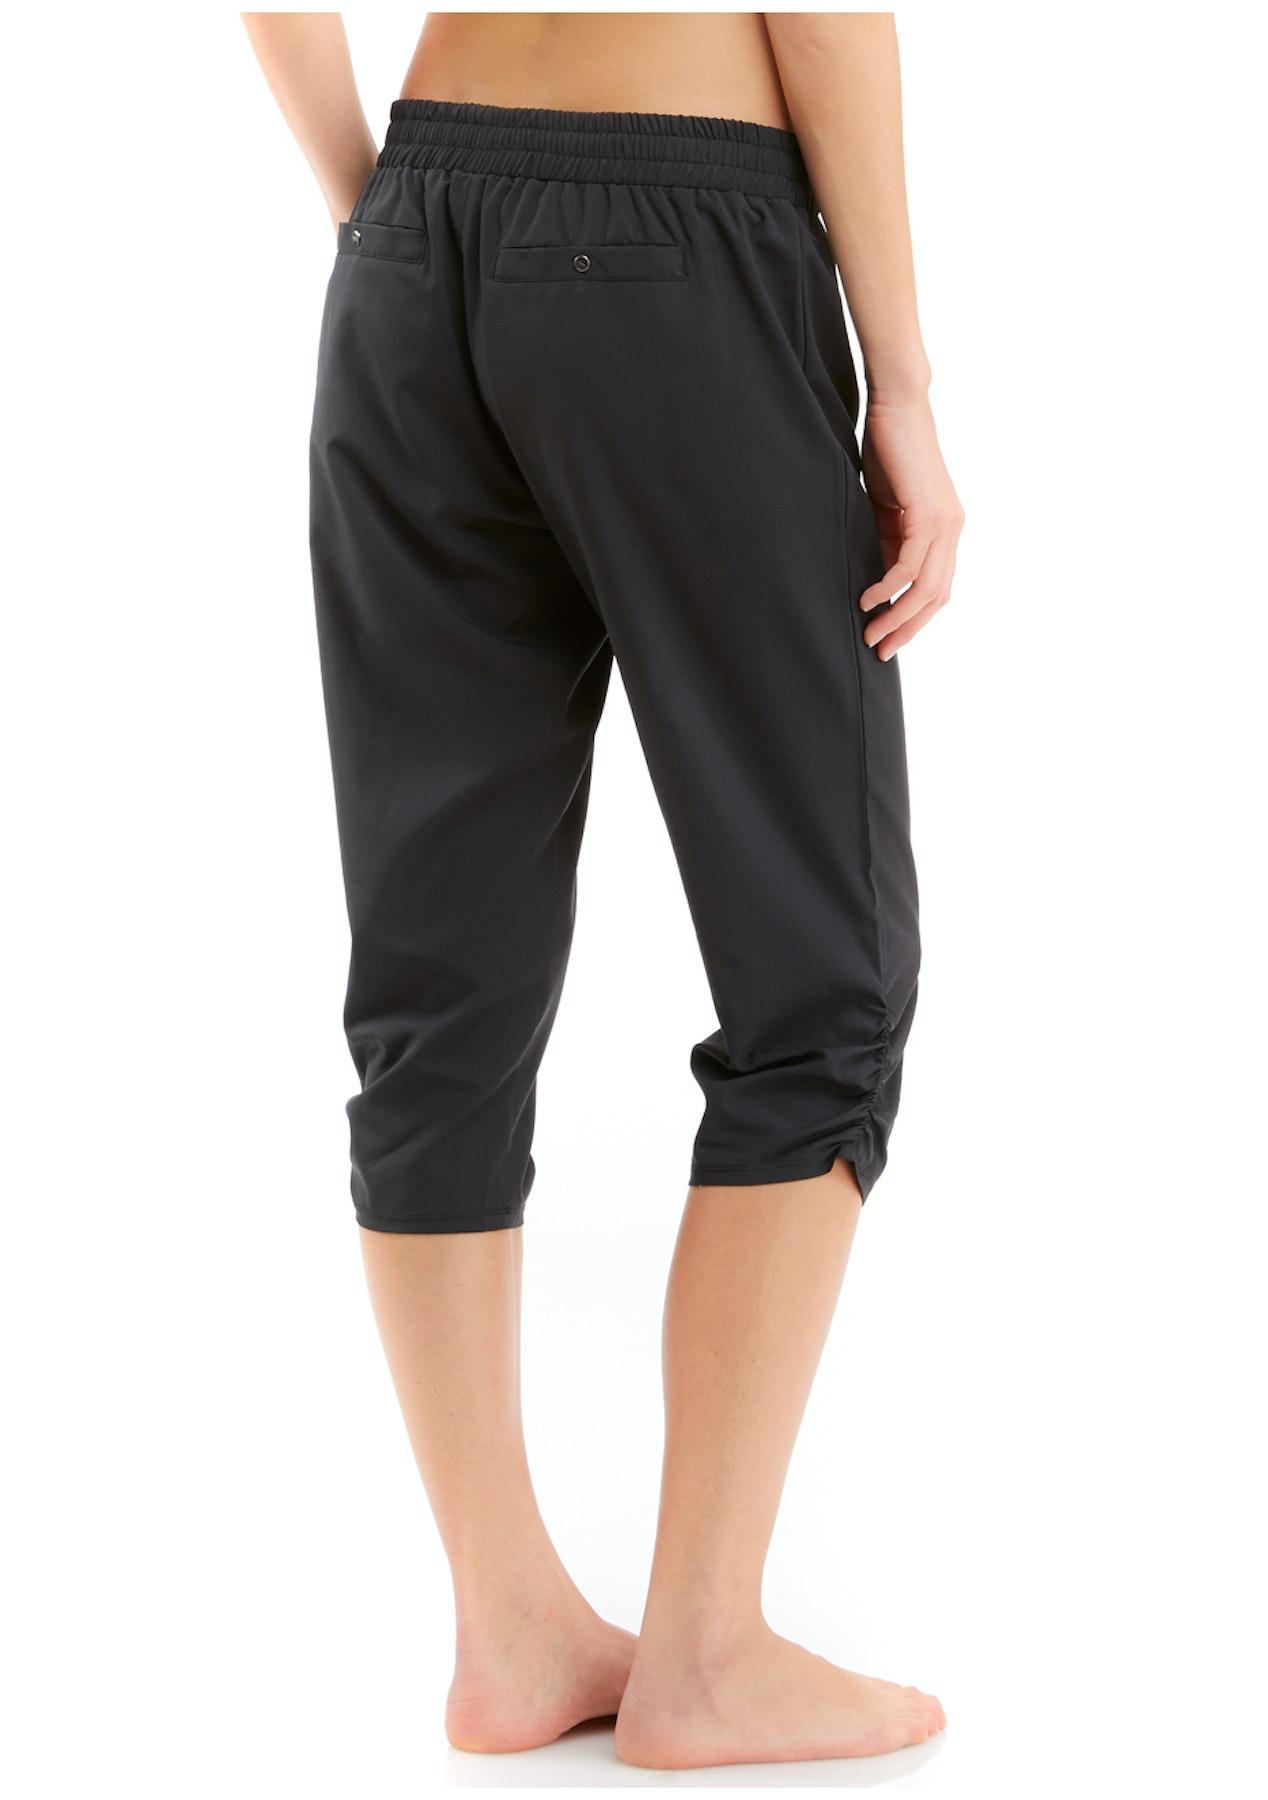 a2ba3be031eb Marika Tek - Ruched Capri Jogger - Black - Marika Activewear Up To 63% Off  - Onceit